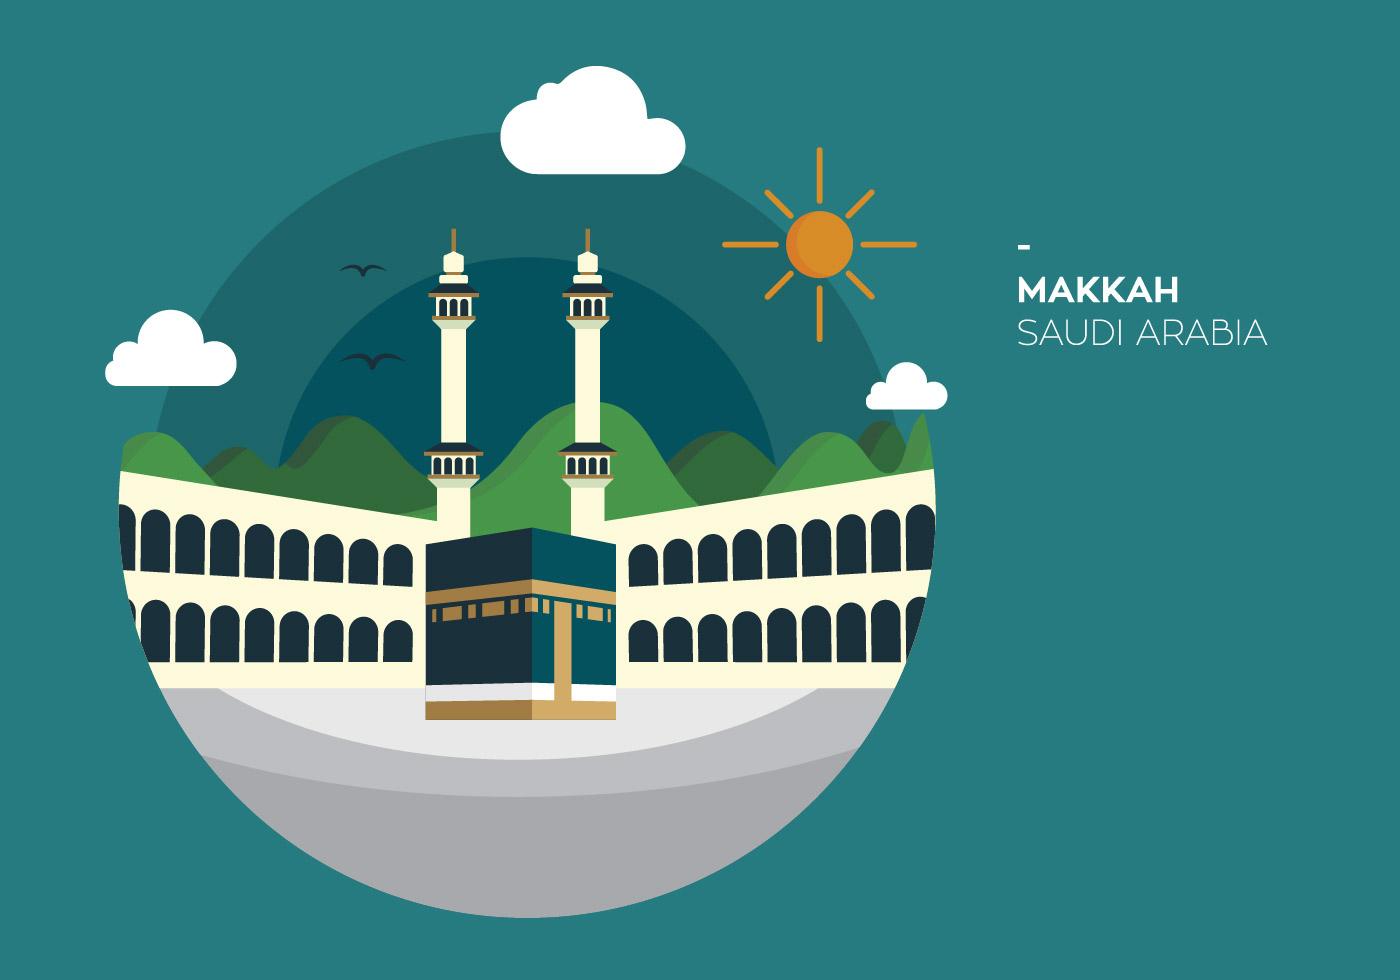 Makkah Kabah Vector 20 Vector Art at Vecteezy